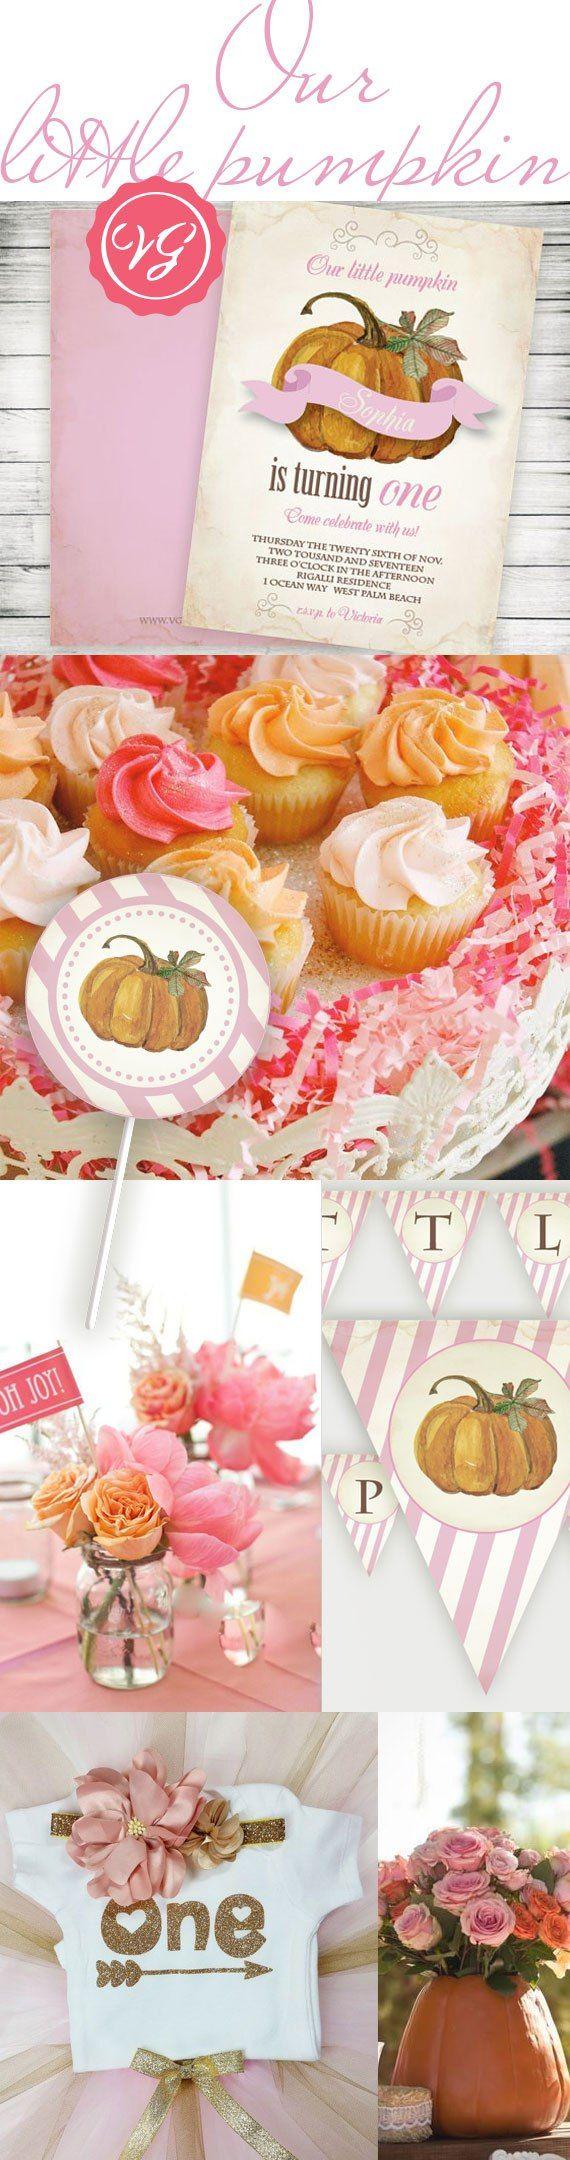 October Birthday Party Ideas - Girl's First Birthday